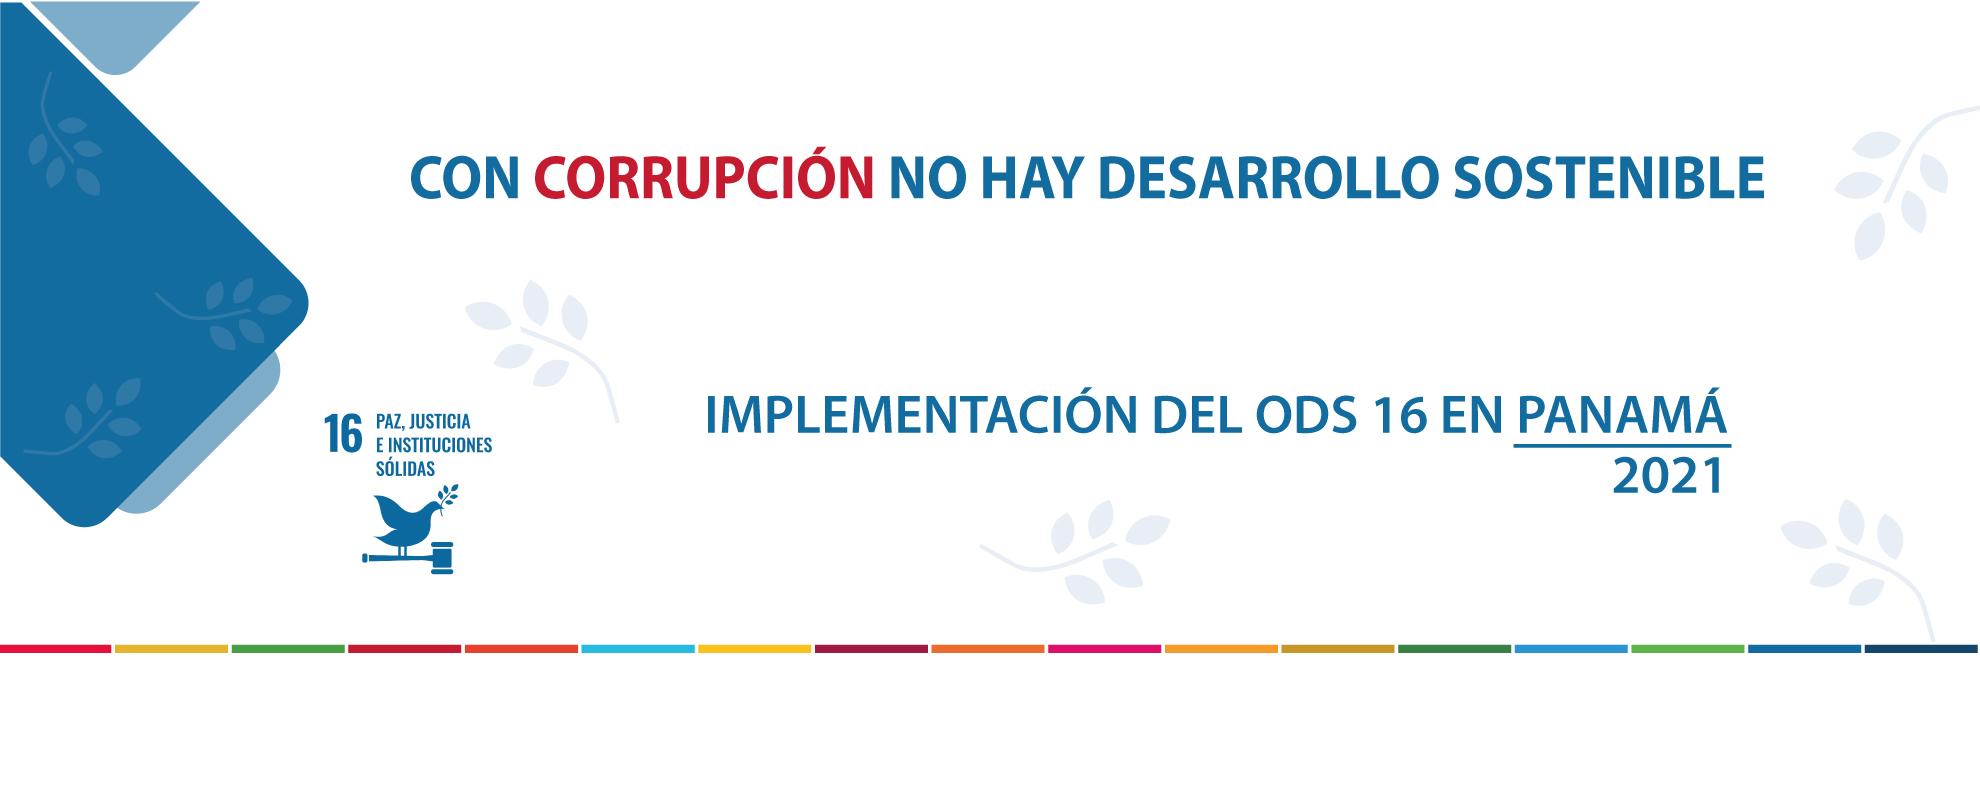 REPORTE SOMBRA: IMPLEMENTACIÓN DEL ODS 16